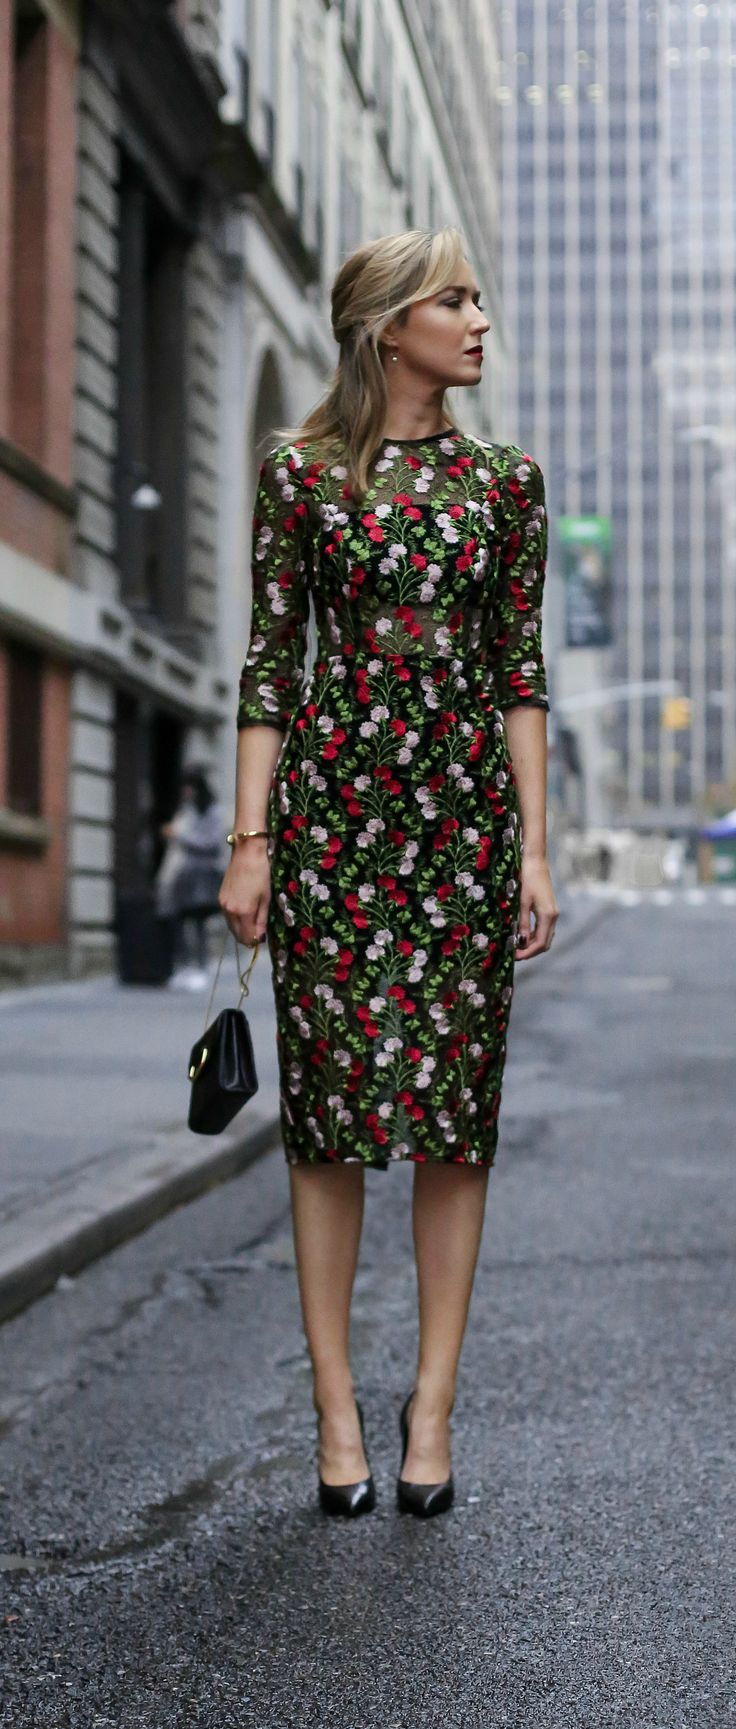 Best 25+ Casual cocktail attire ideas on Pinterest ...